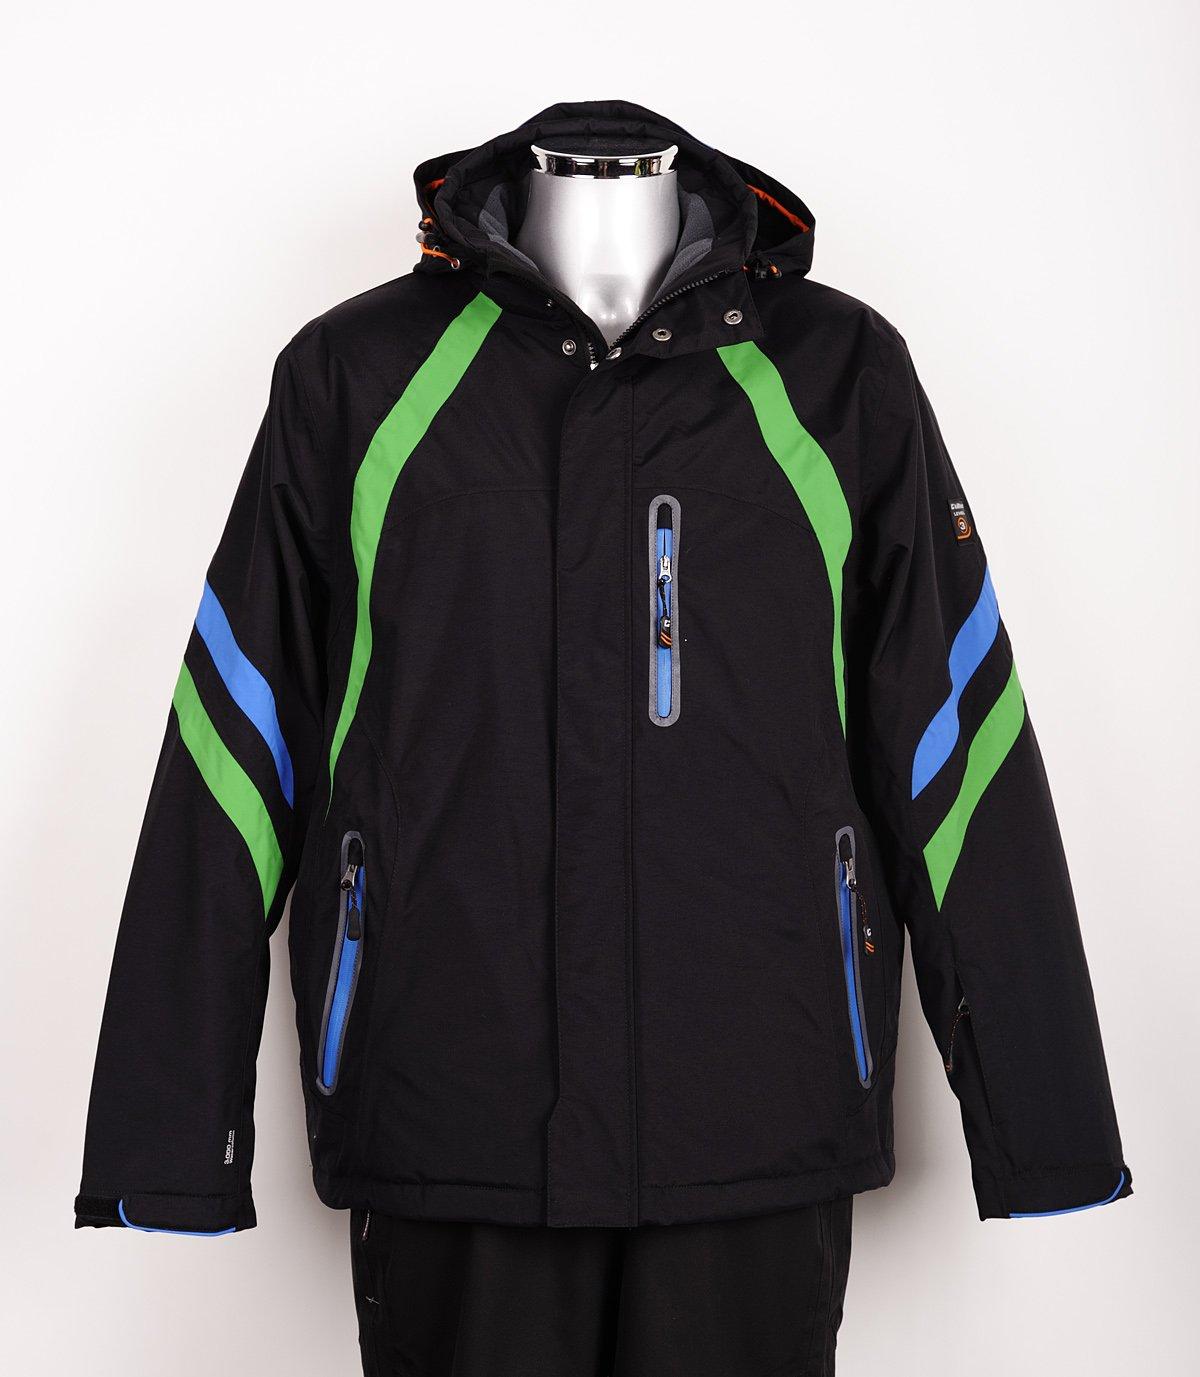 competitive price c5191 a0284 Killtec Alvar Herren Skijacke Snowboardjacke, schwarz, Größe ...